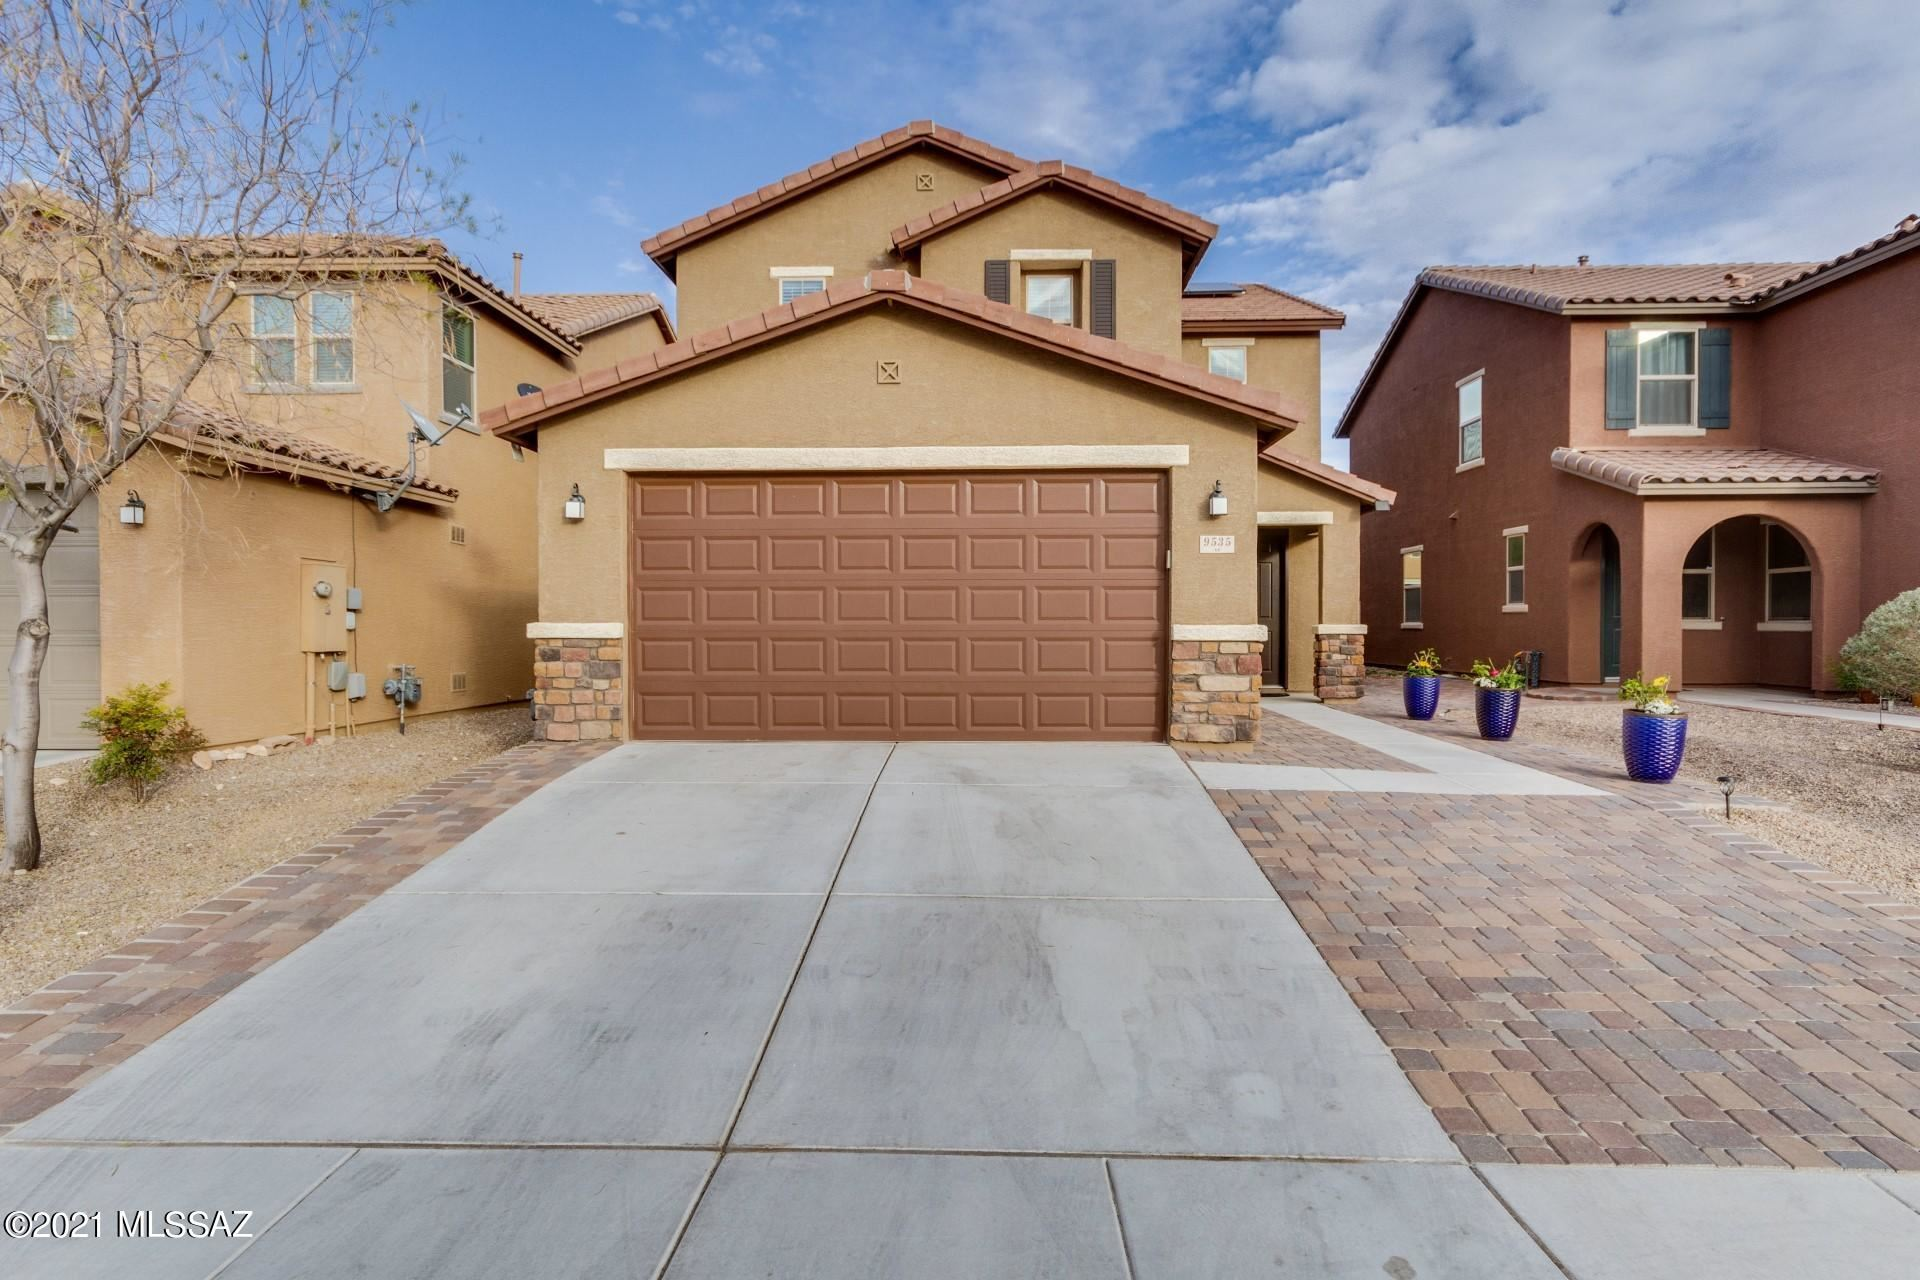 9535 S Crowley Brothers Drive, Tucson, AZ 85747 - MLS#: 22104277